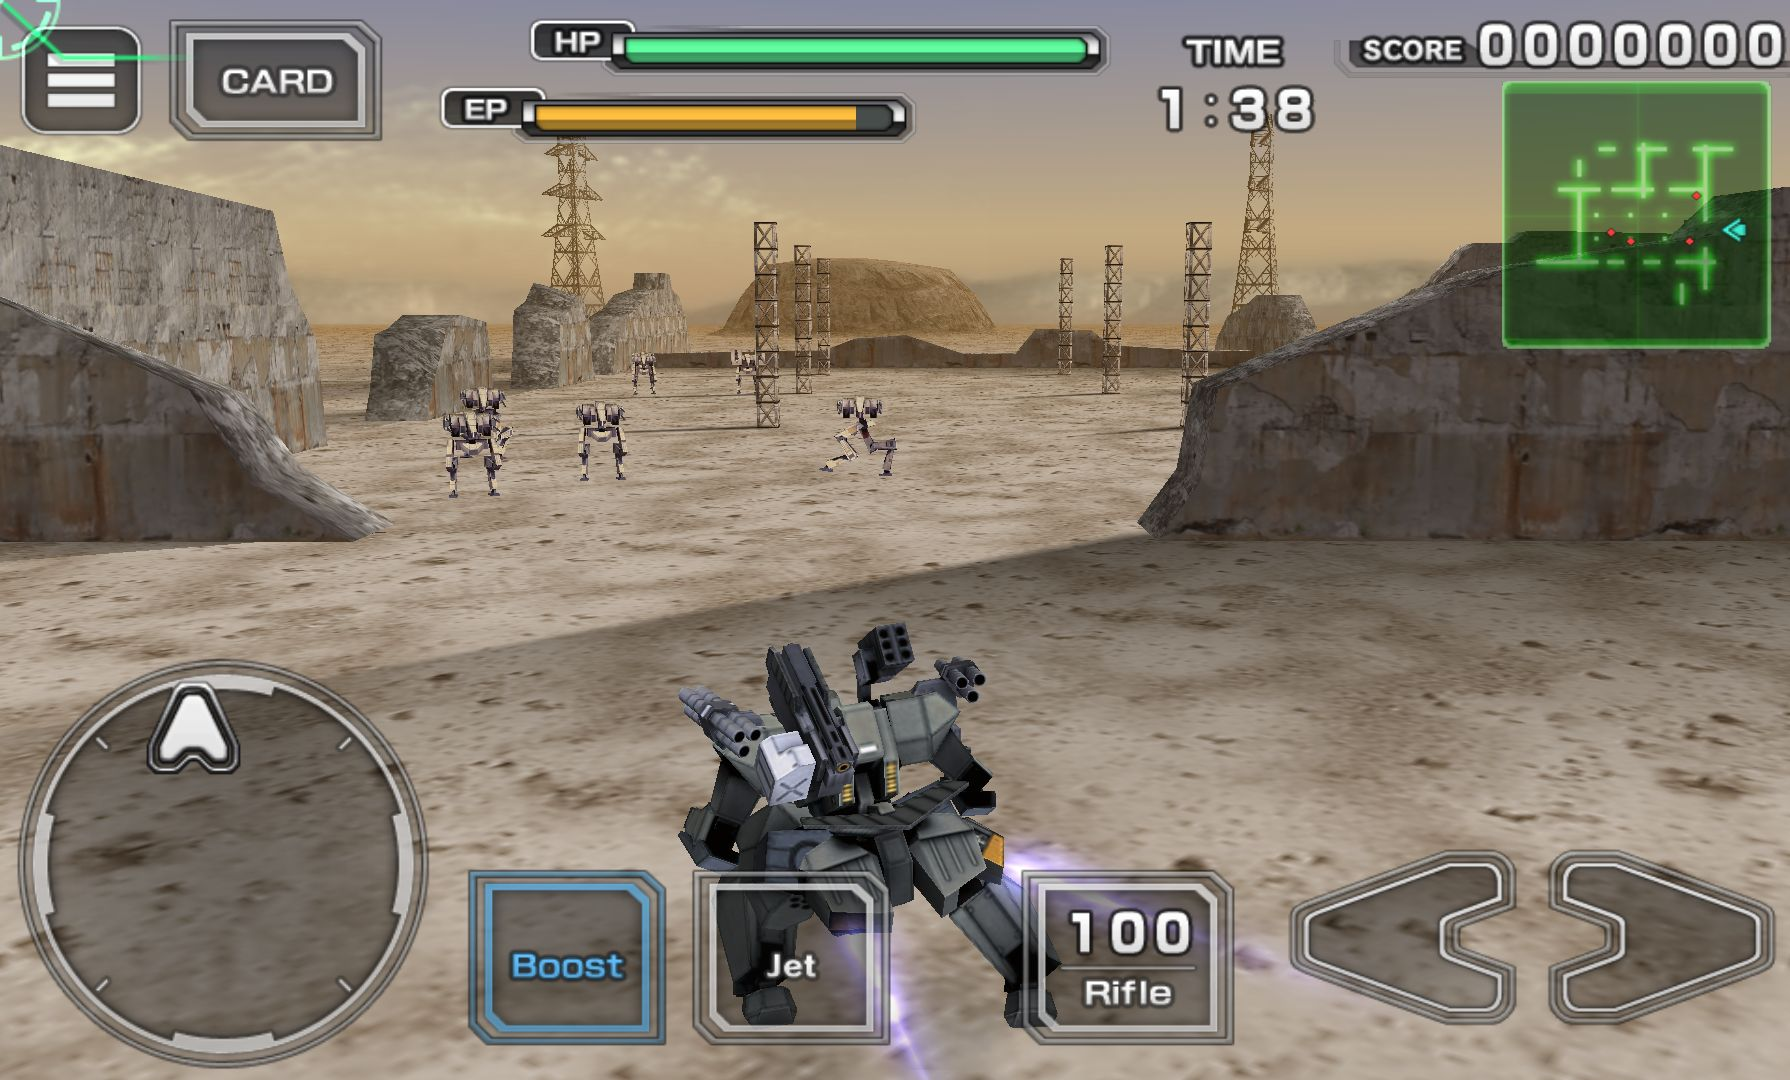 androidアプリ デストロイ・ガンナーズ シグマ(Destroy Gunners Σ)攻略スクリーンショット2